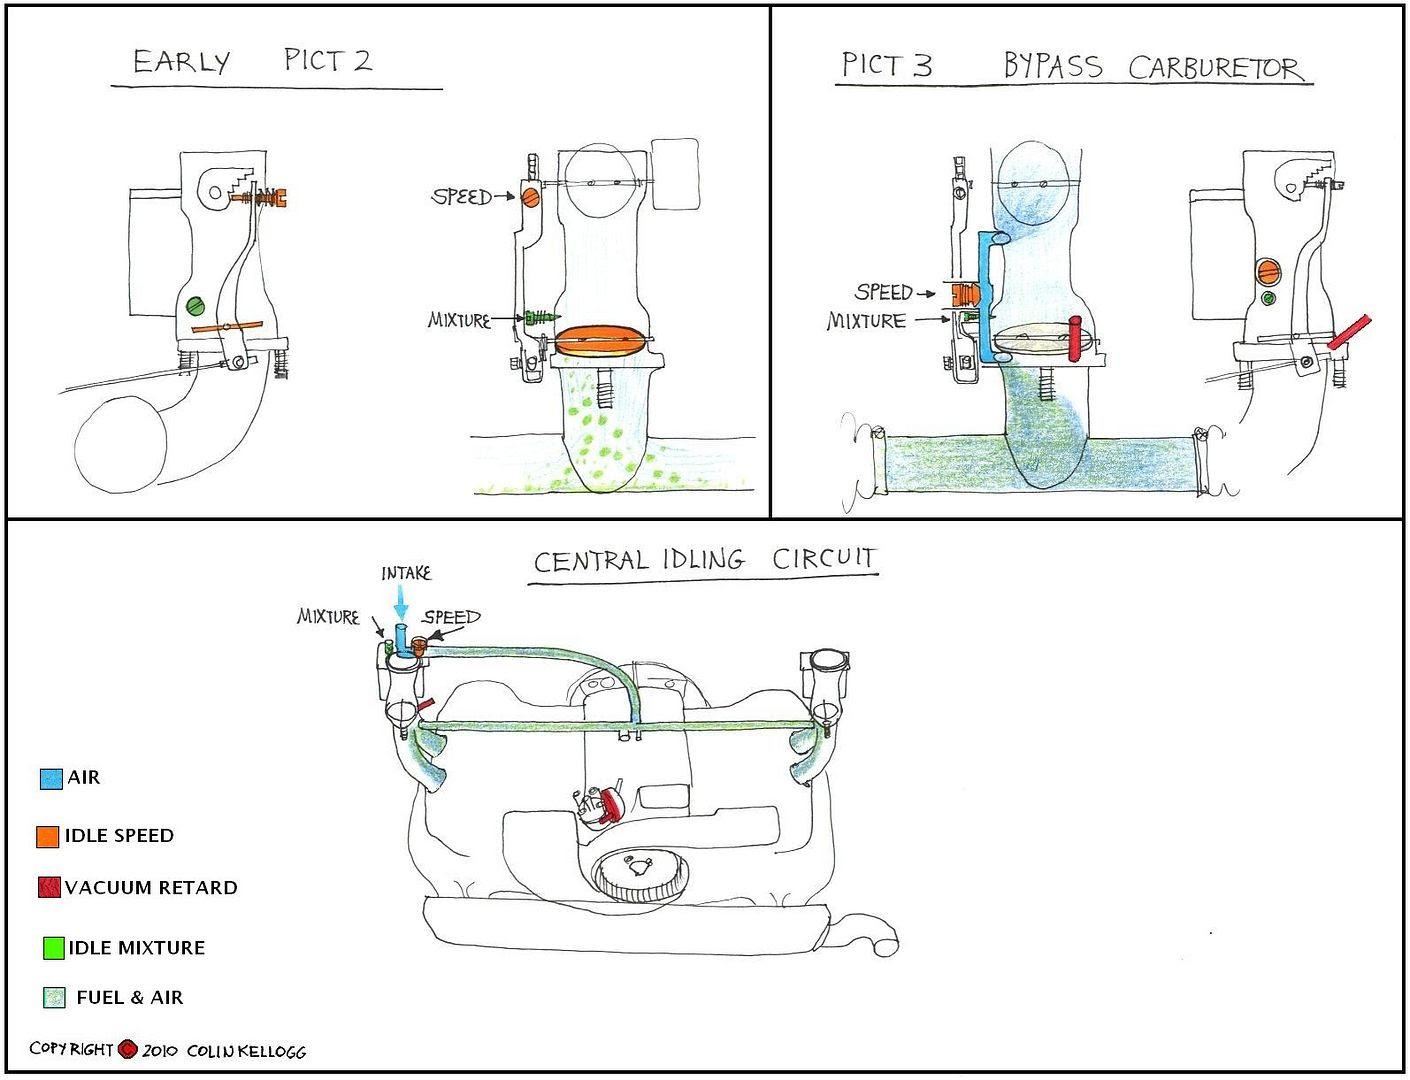 1972 Vw Dual Carb Engine Diagram Wiring Diagram Enter Enter Lechicchedimammavale It